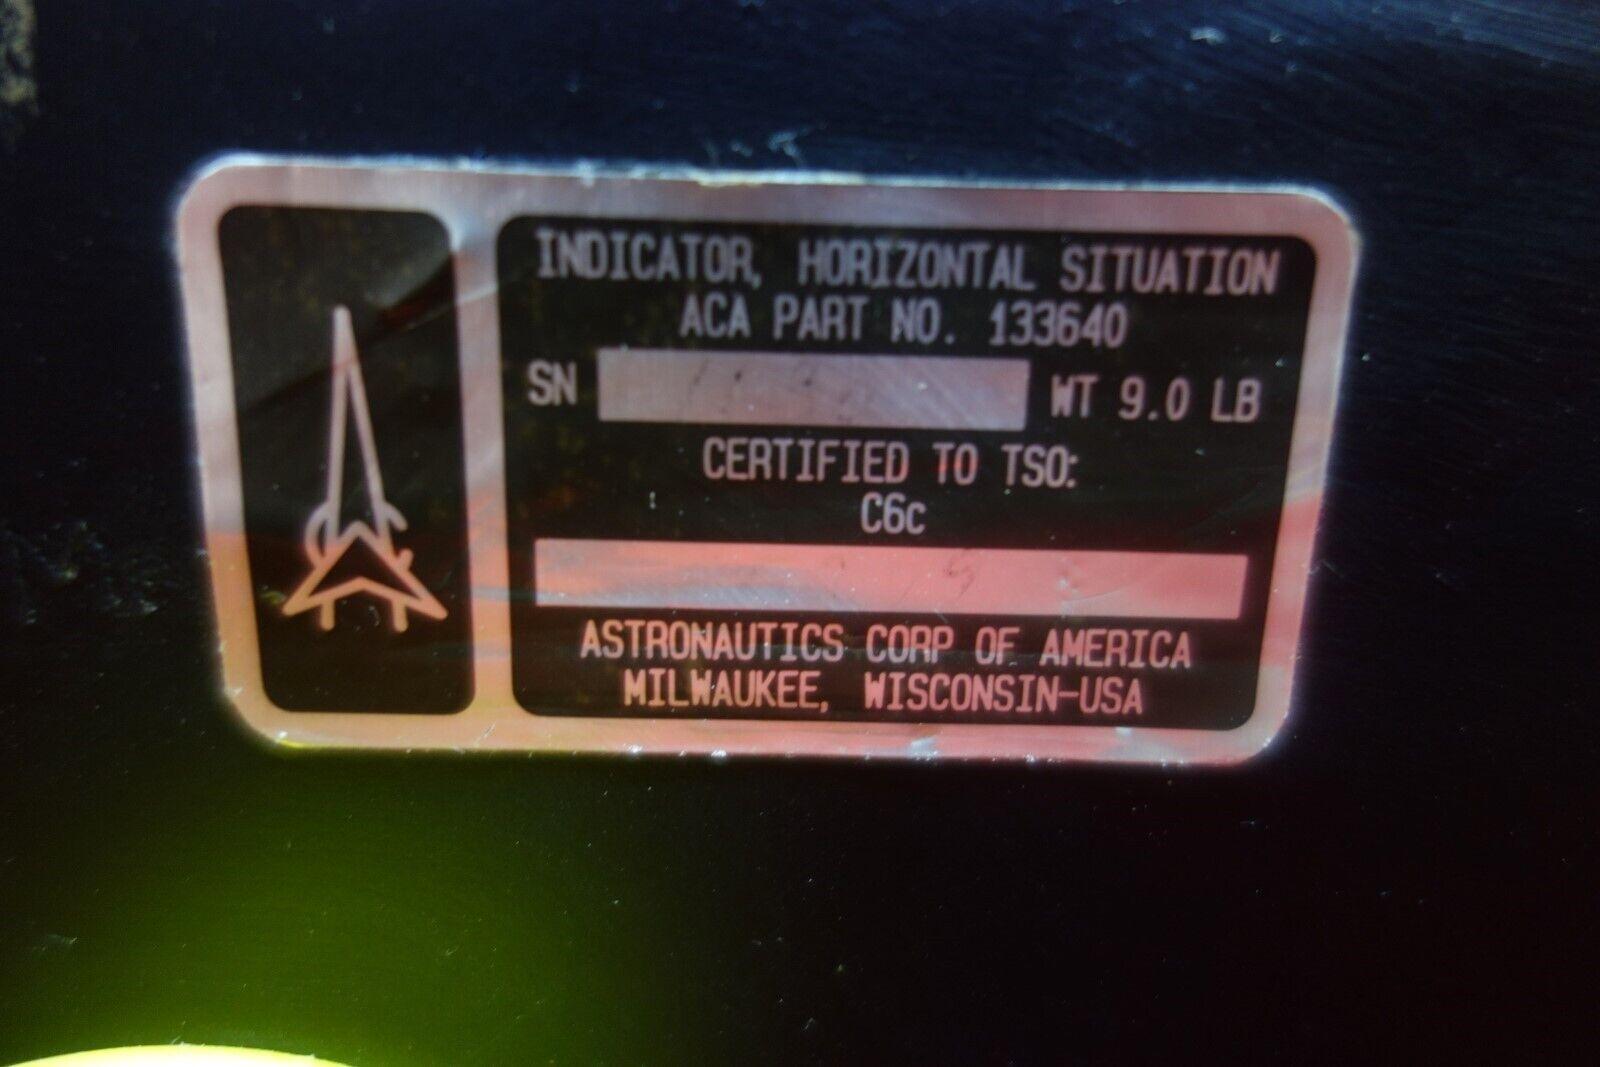 Astronautics Corp of America Horizontal Situation Indicator PN 133640